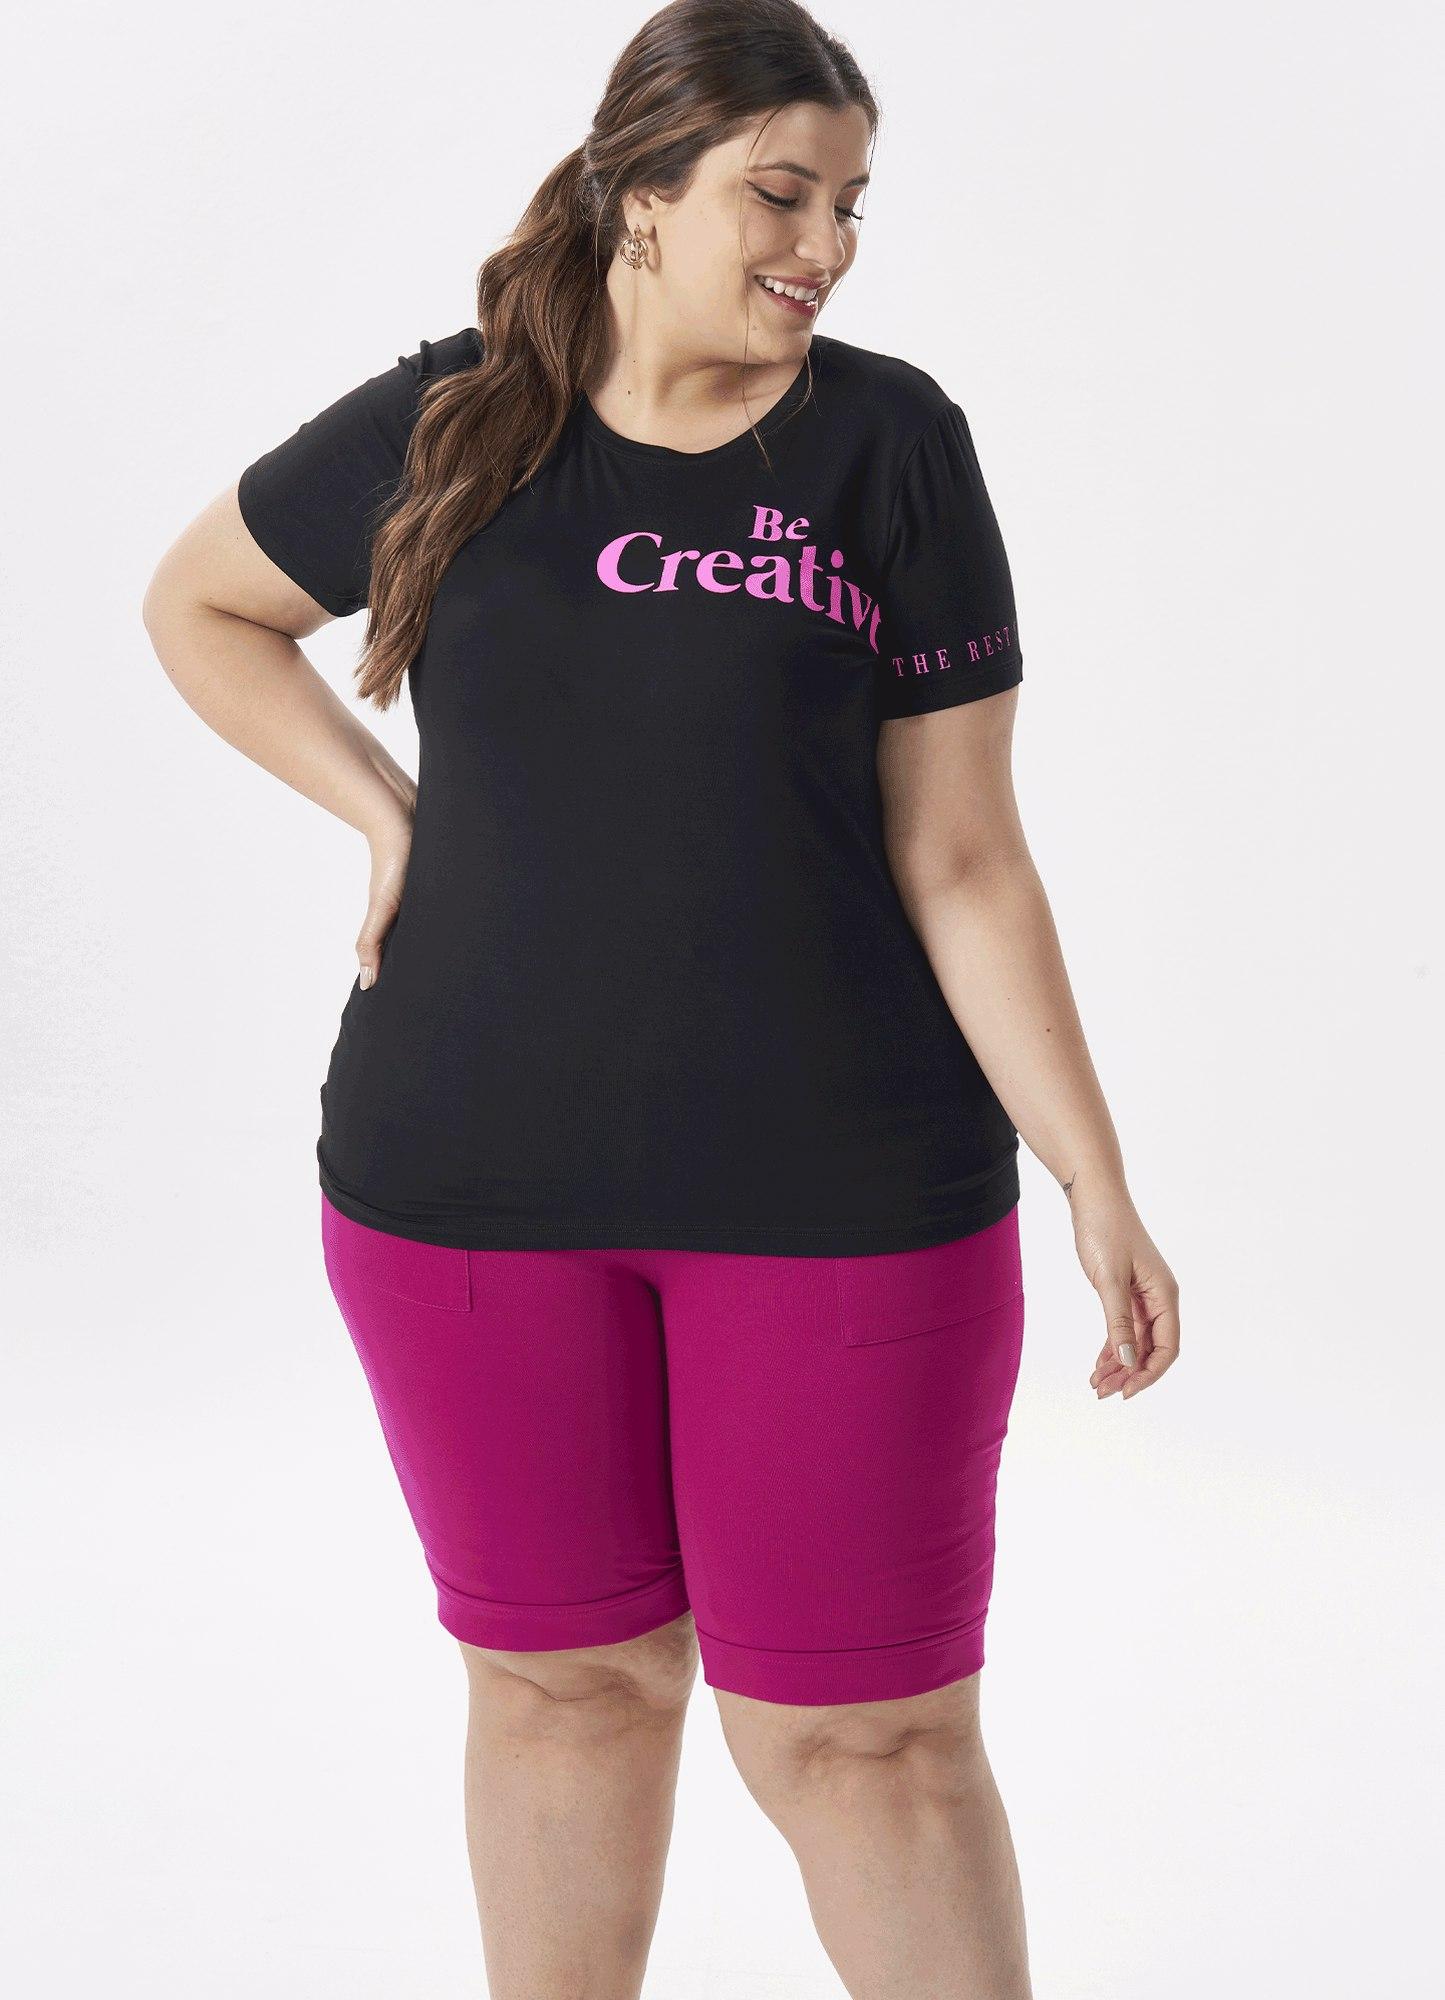 Blusa T-shirt Feminina Malha Preta Estampa